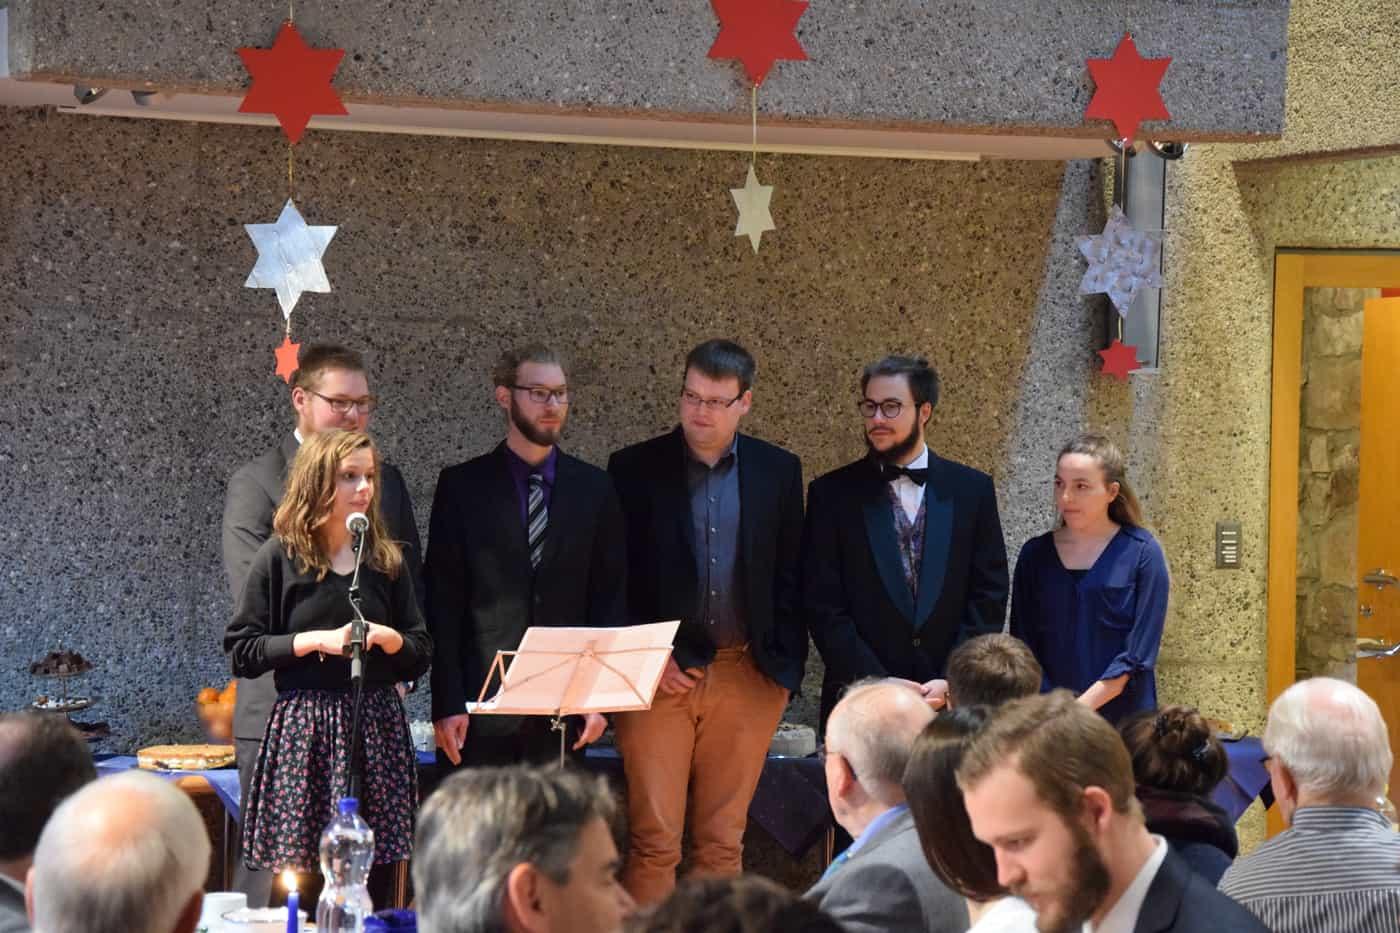 Sth Basel Adventsfeier 2017 7